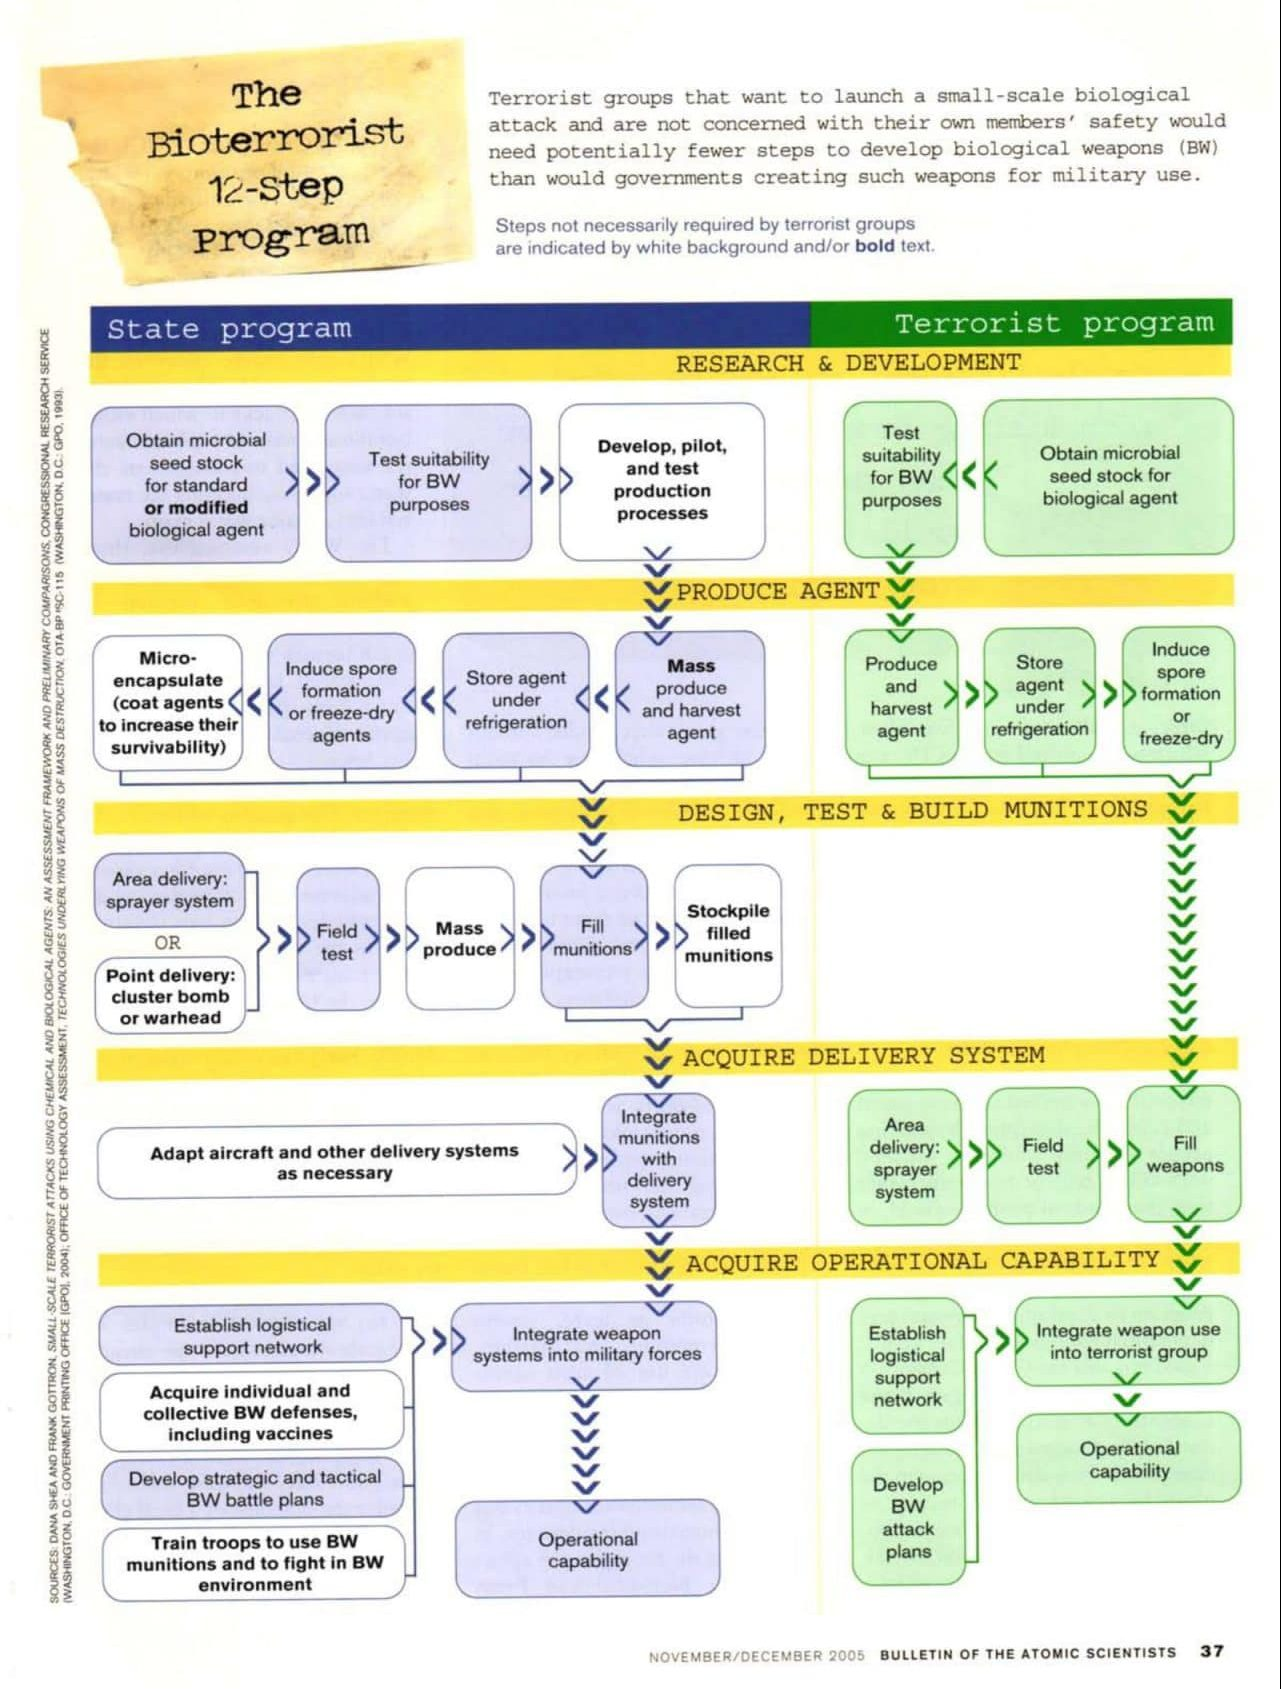 The bioterrorist 12-step program chart